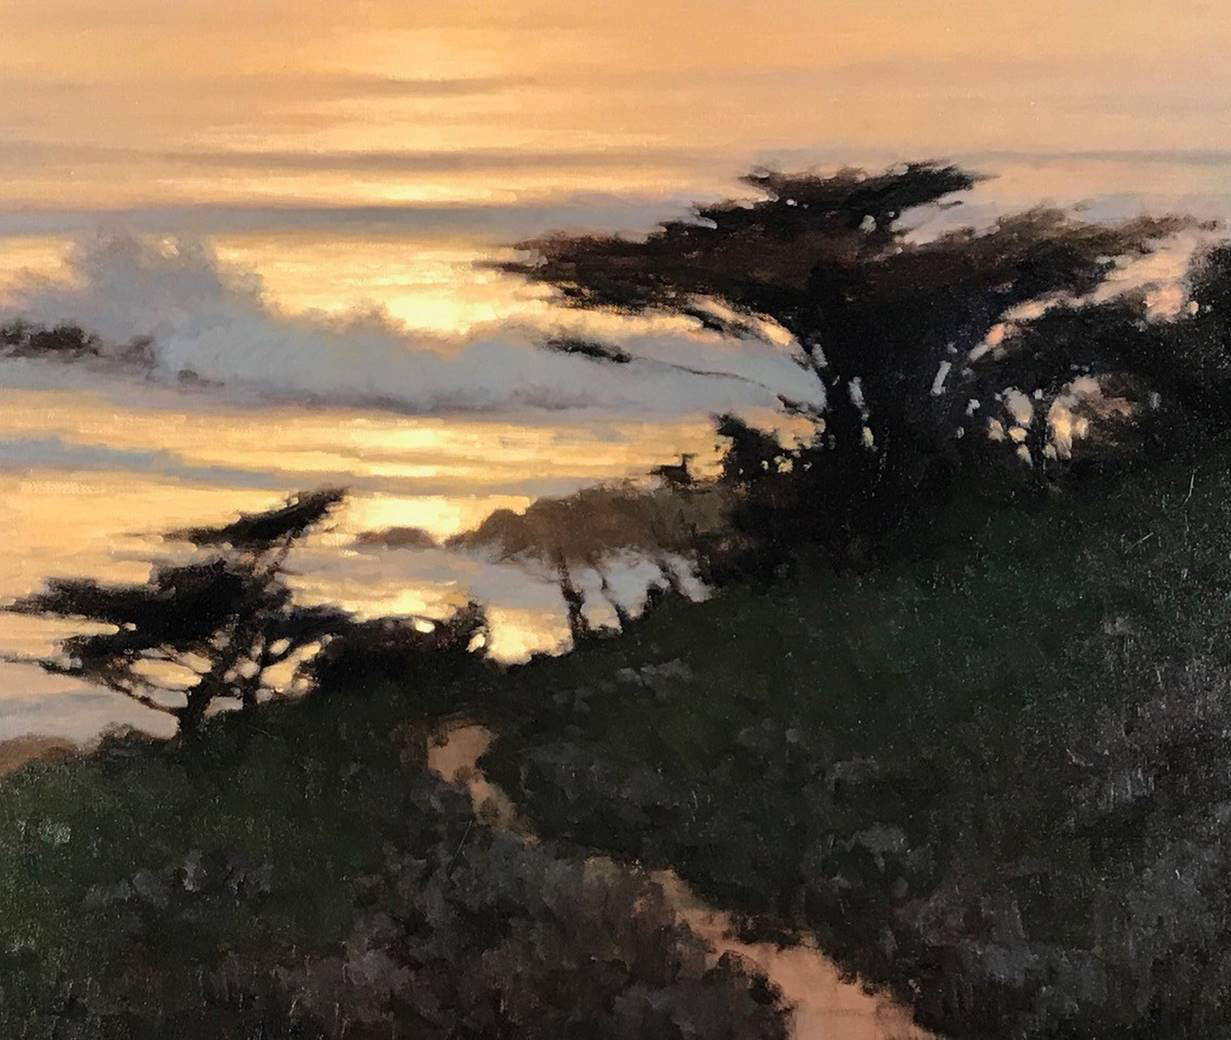 Blood Sunset at Pt Lobos